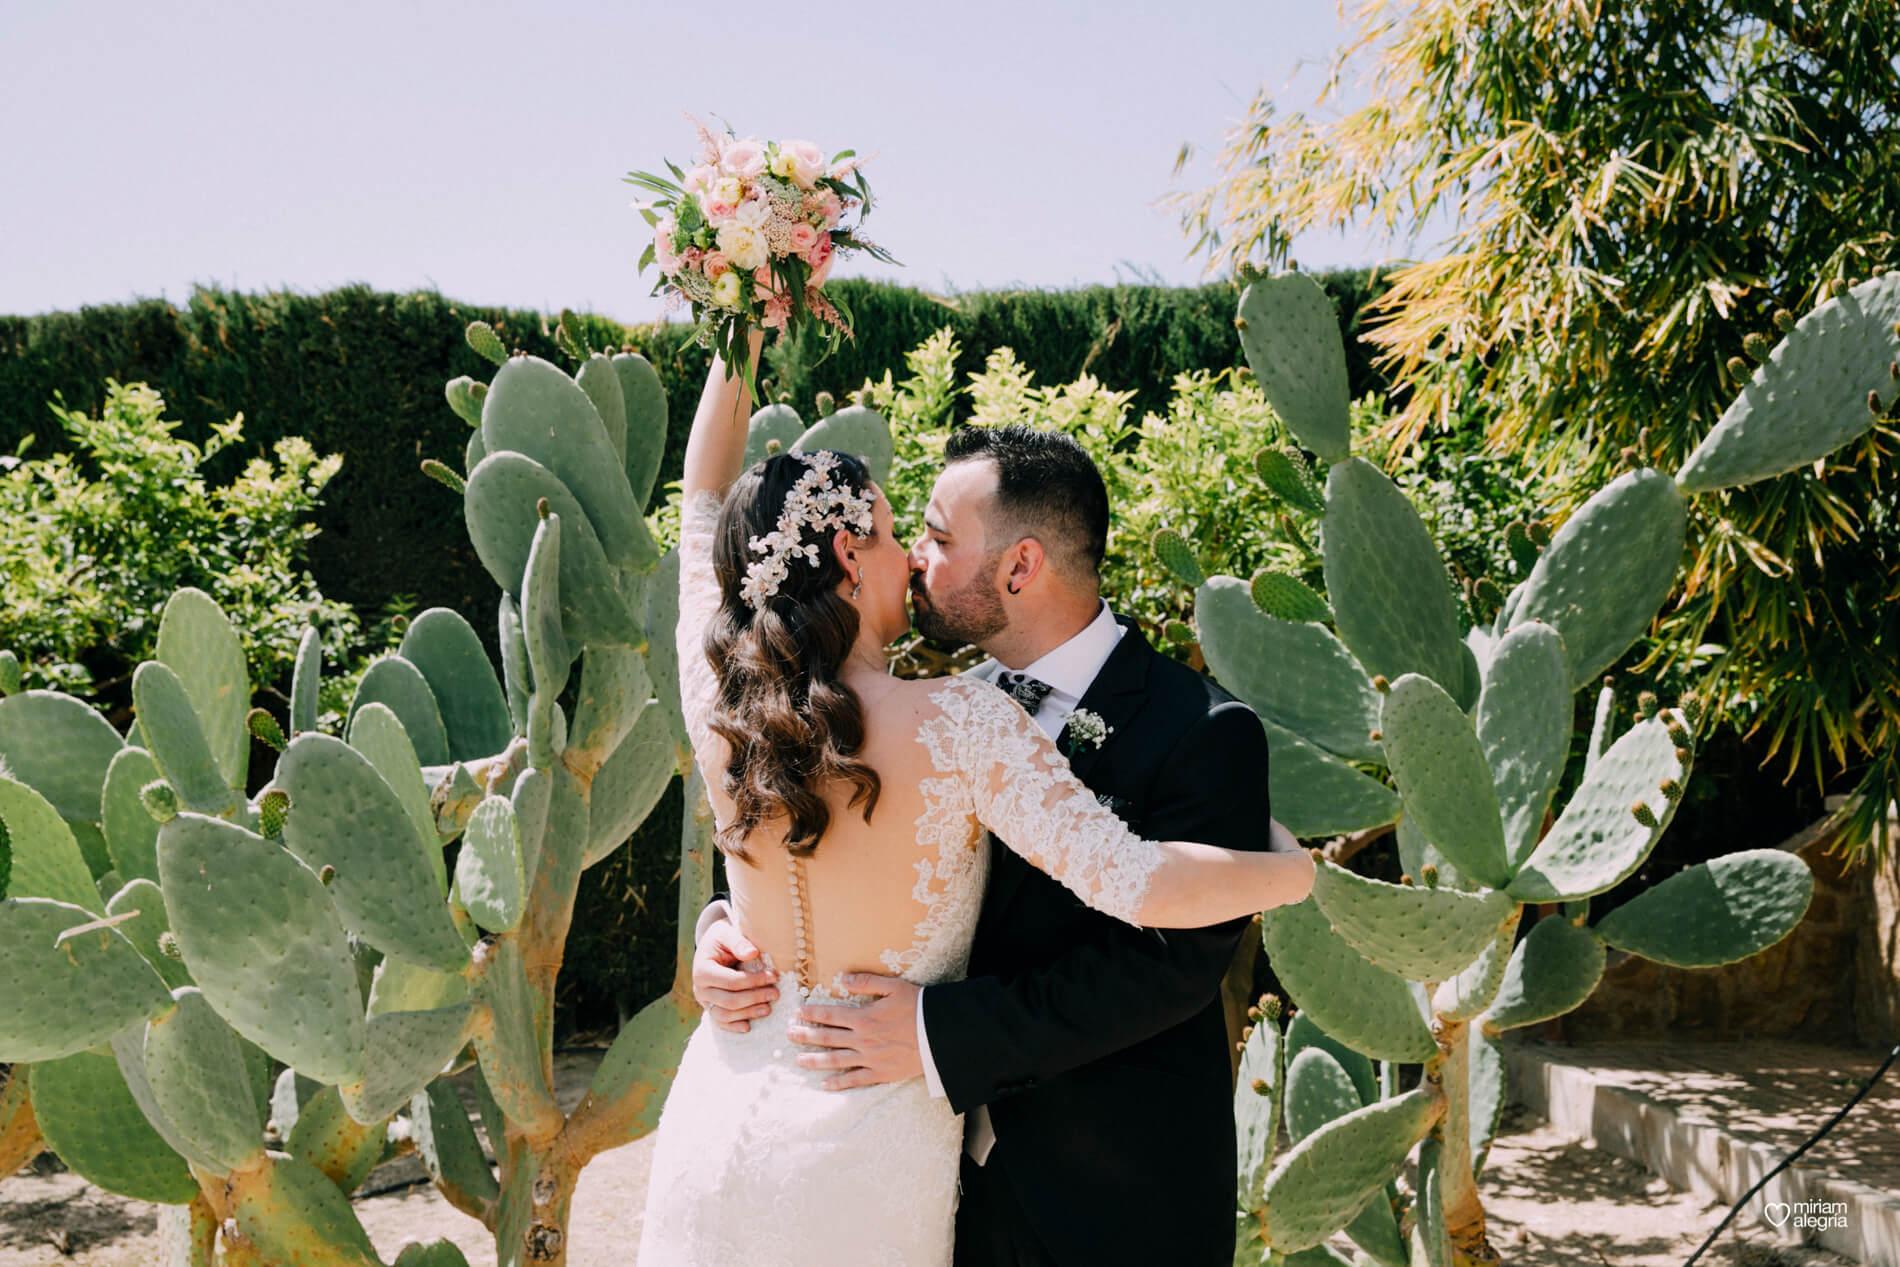 boda-en-finca-jurosa-miriam-alegria-89